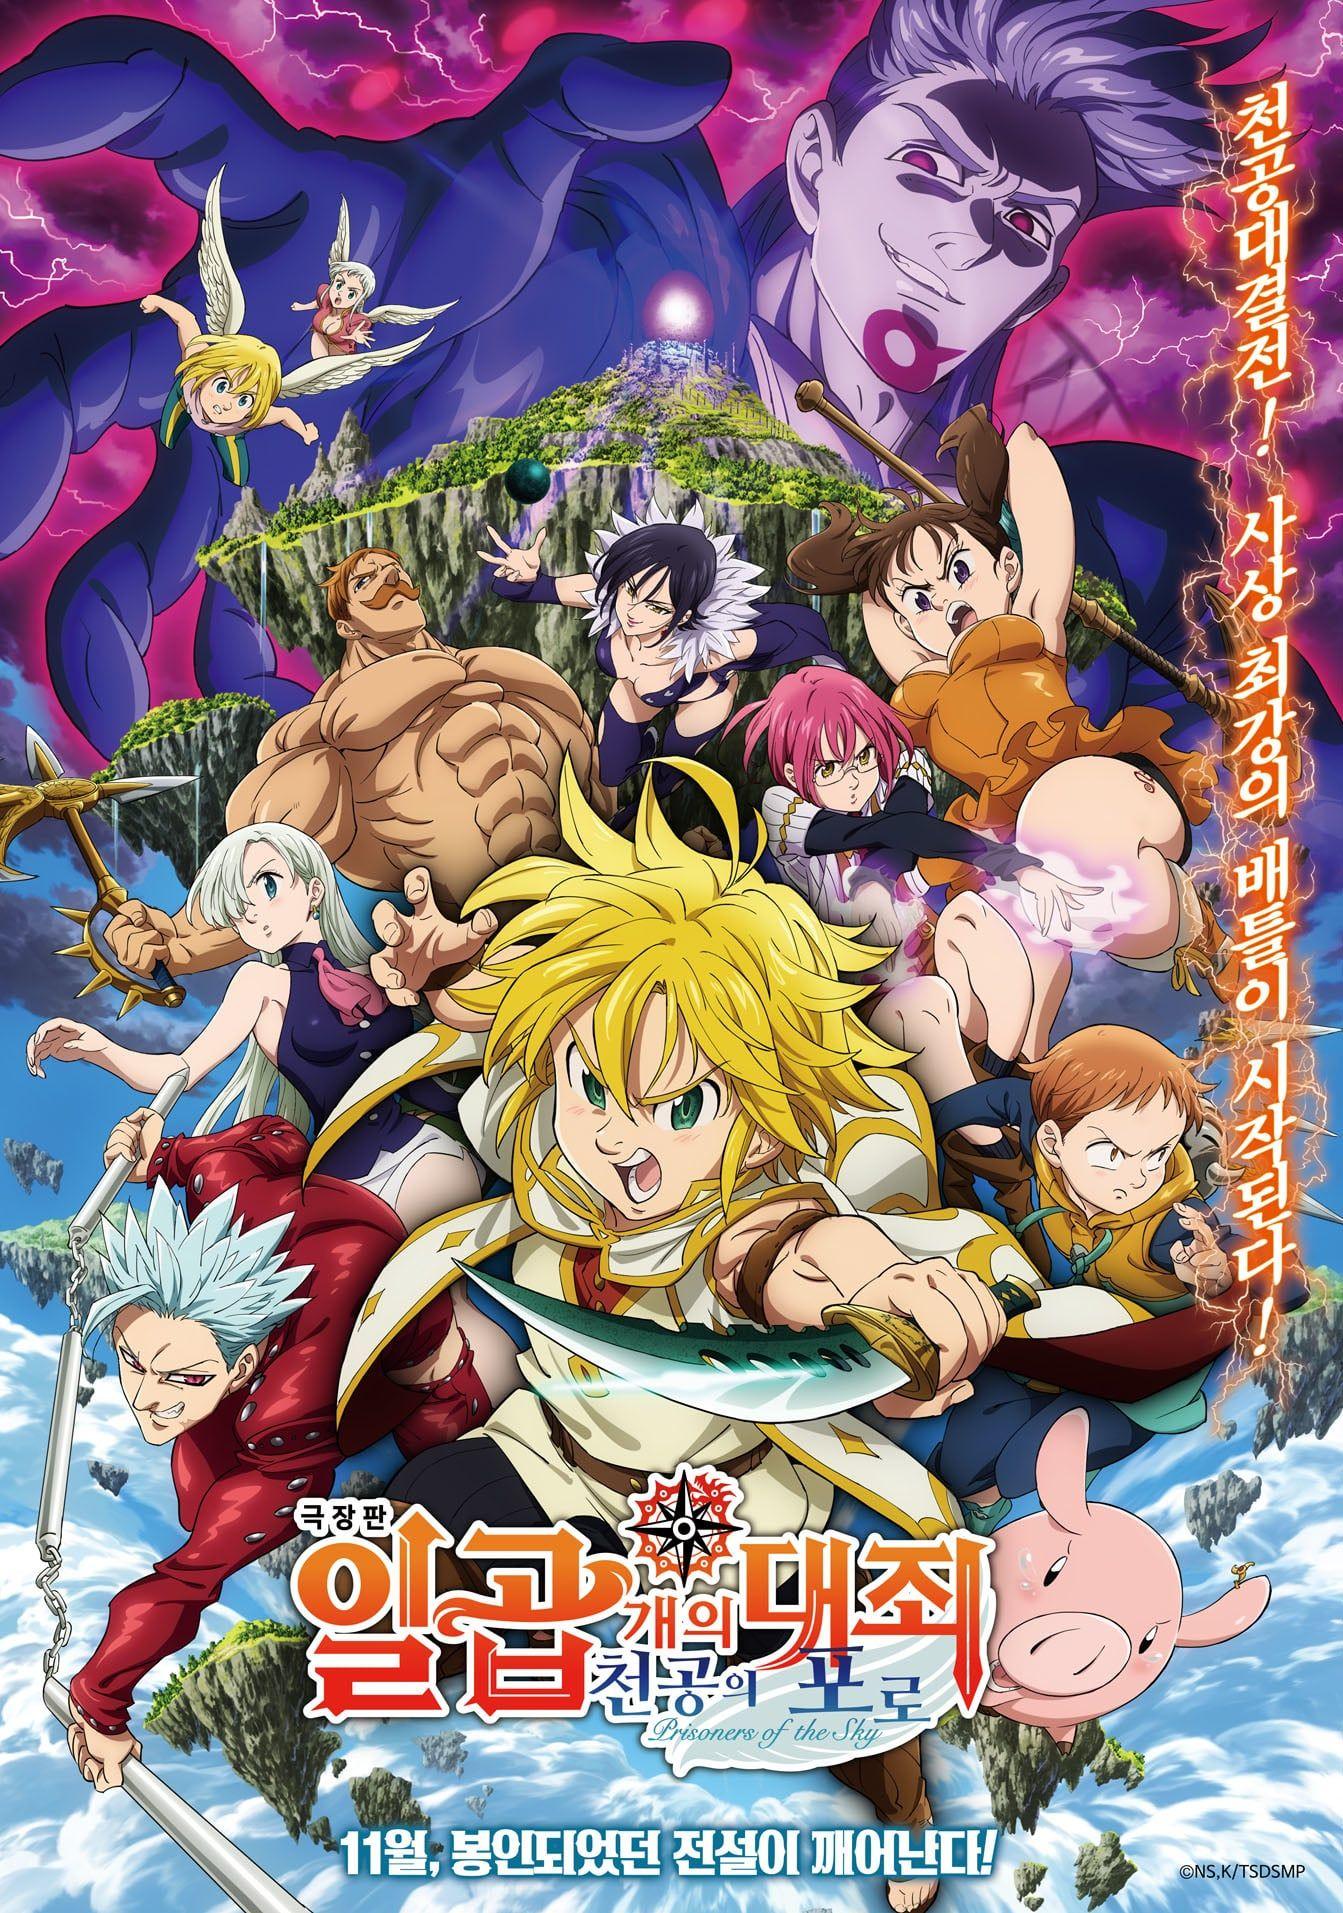 Assistir Nanatsu No Taizai Prisioneiros Do Ceu Dublado Hd Online Gratis Seven Deadly Sins Anime Nanatsu No Taizai Manga Nanatsu